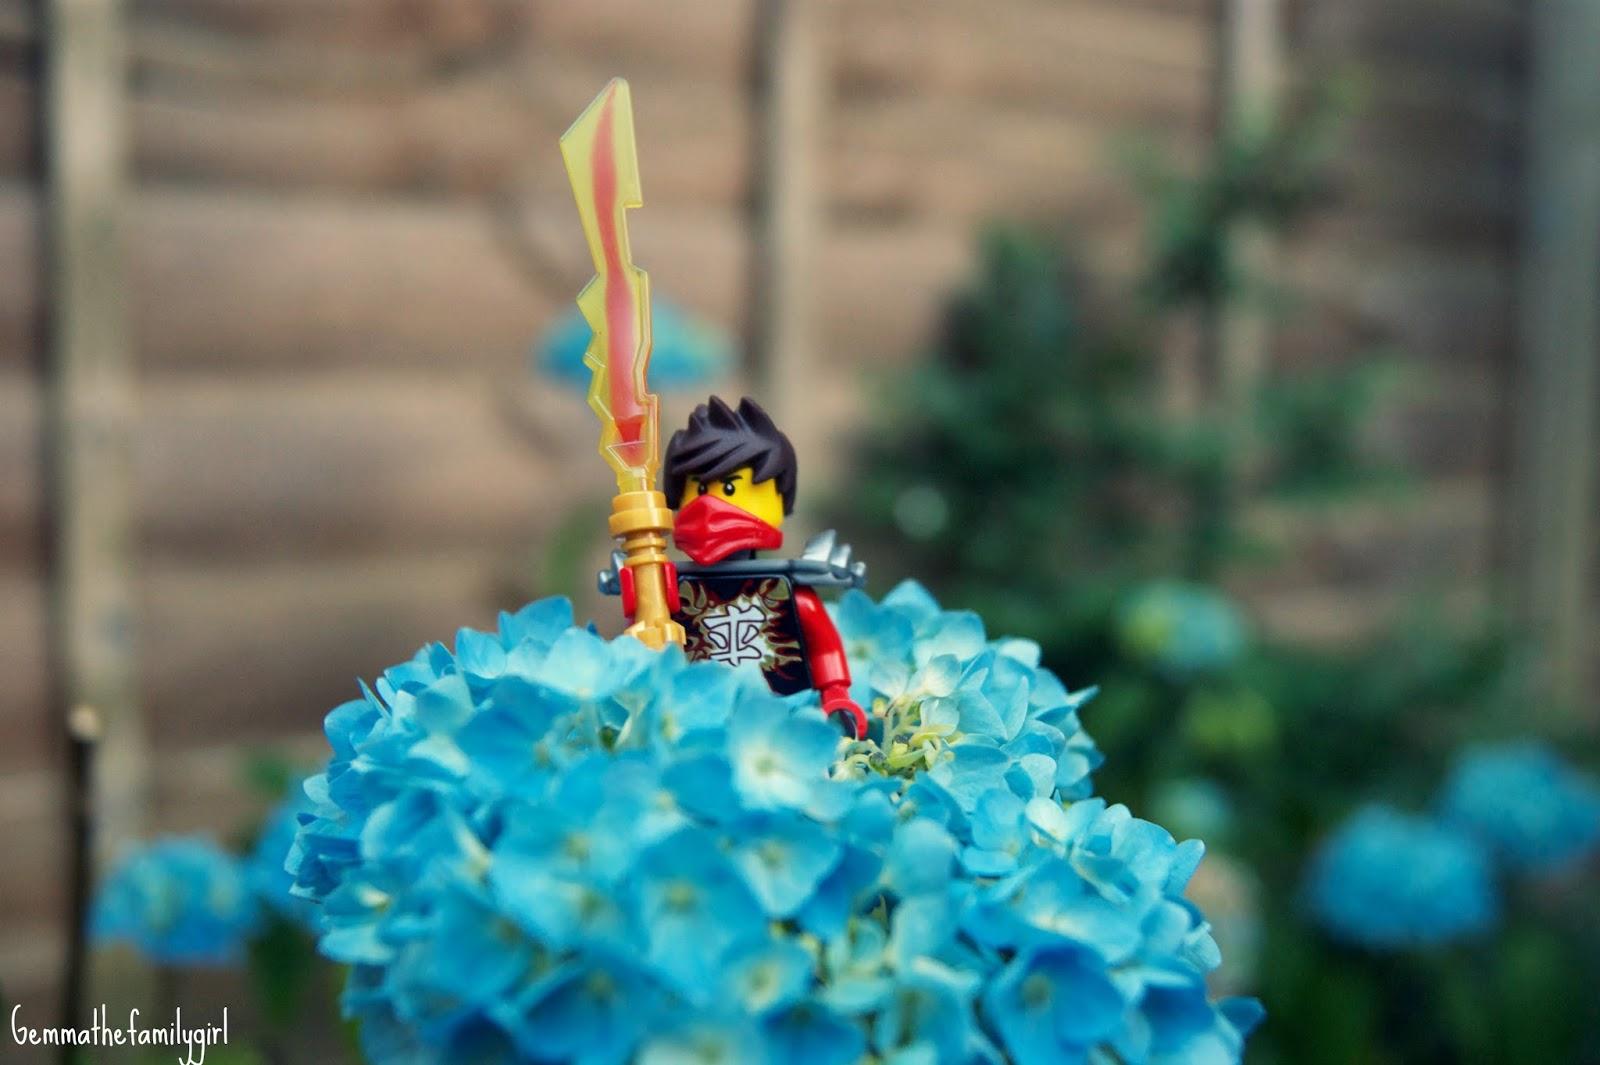 lego, mini figure, ninja, ninjago, parent, blogger, photography